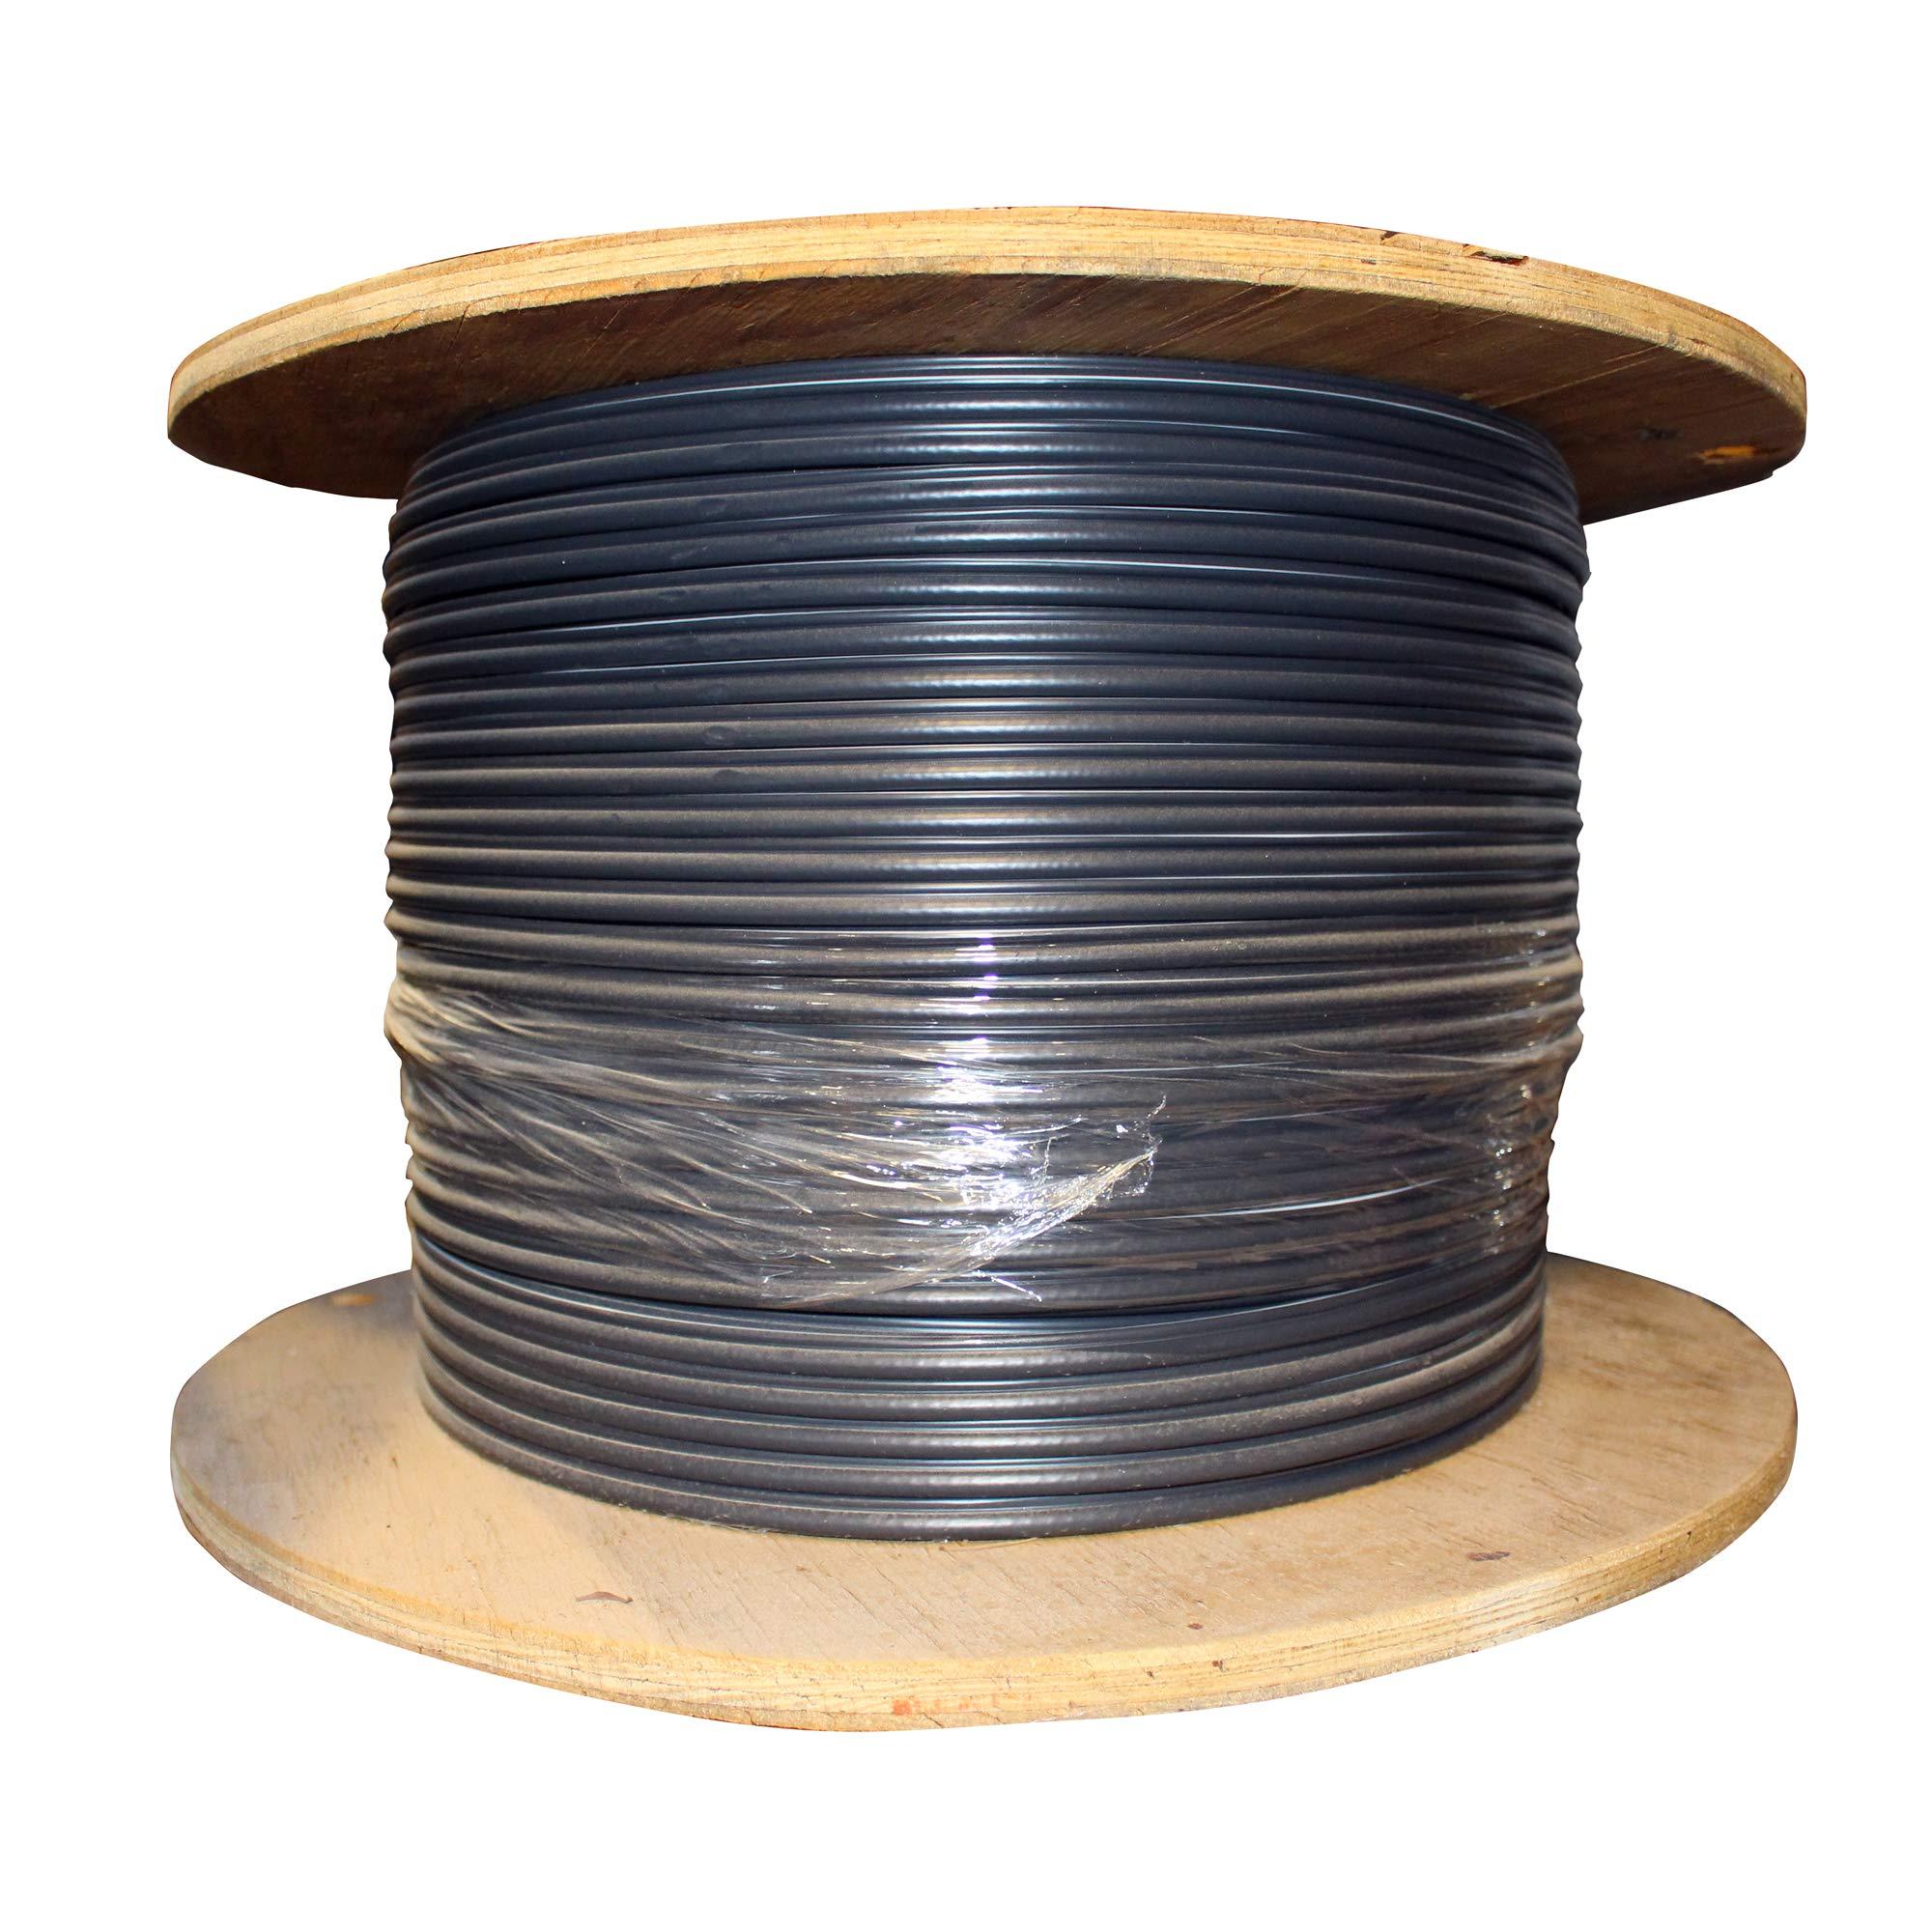 Commscope 770021003 Coaxial RG6 Drop Cable, Fiber Tracer, 18-AWG, CATV SATV, Black, 1000-Ft